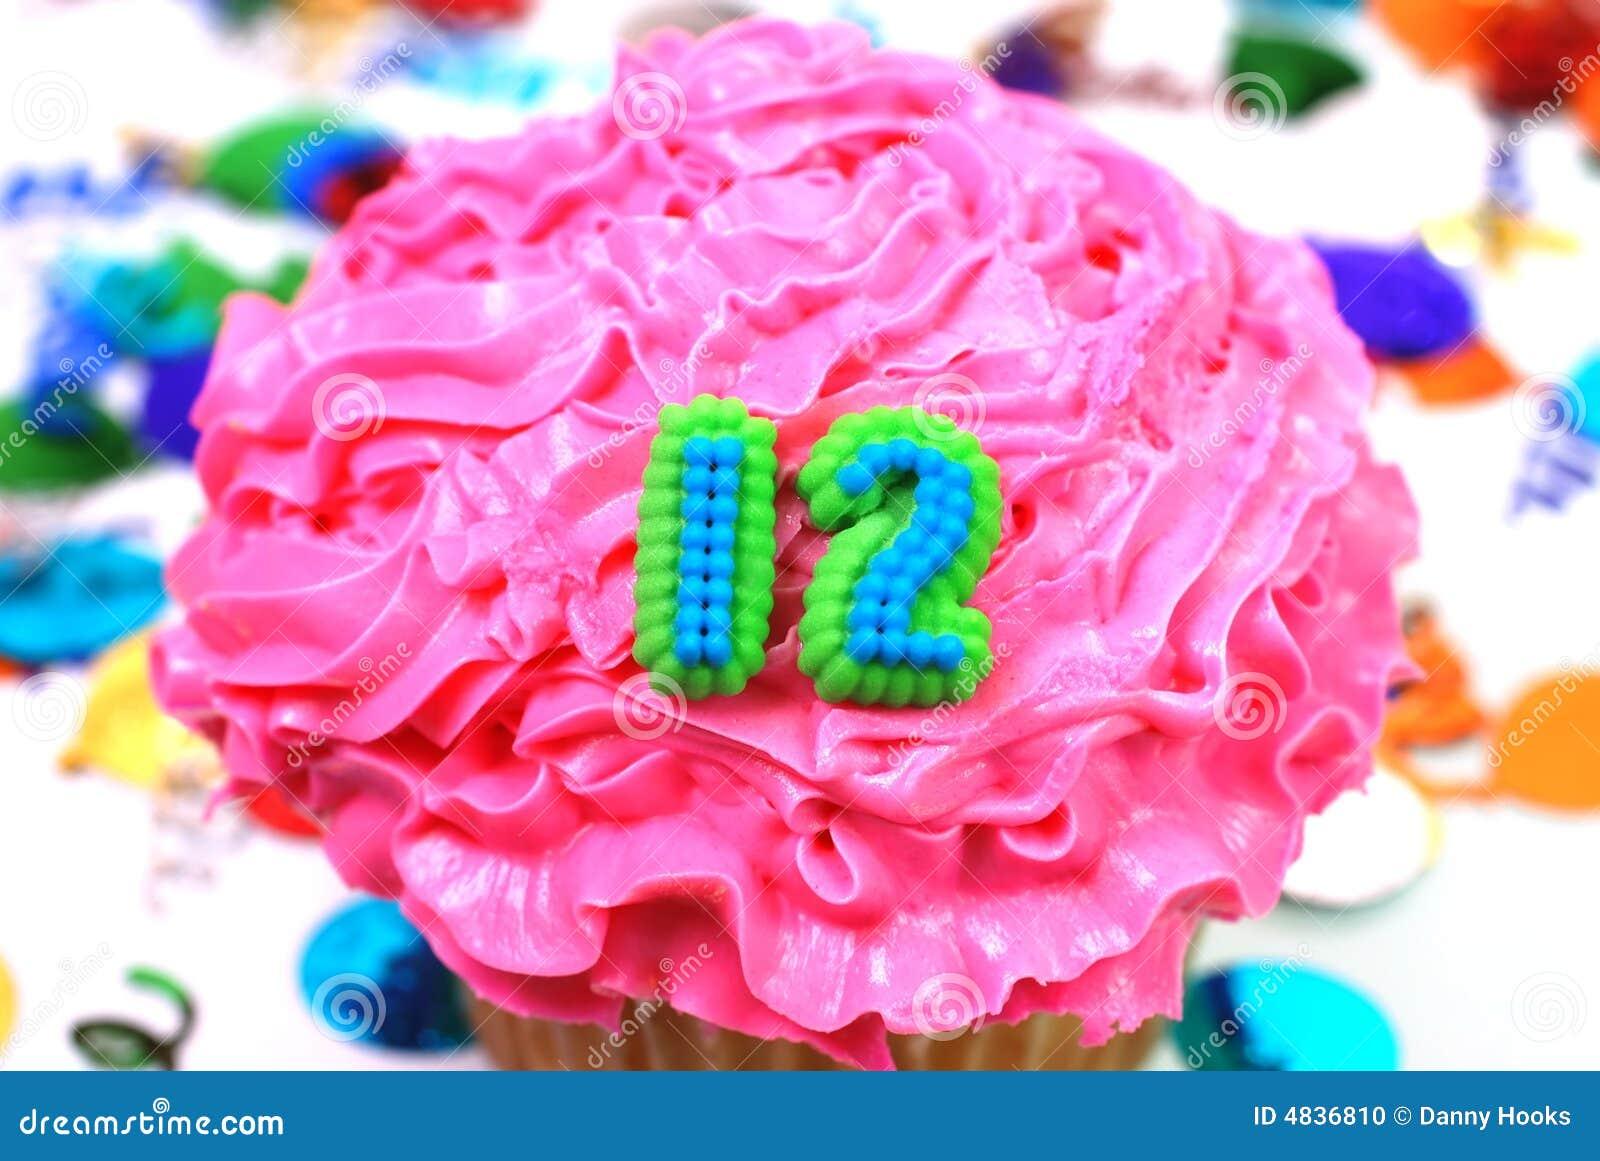 Celebration Cupcake Number 12 Stock Photo Image Of Birthday